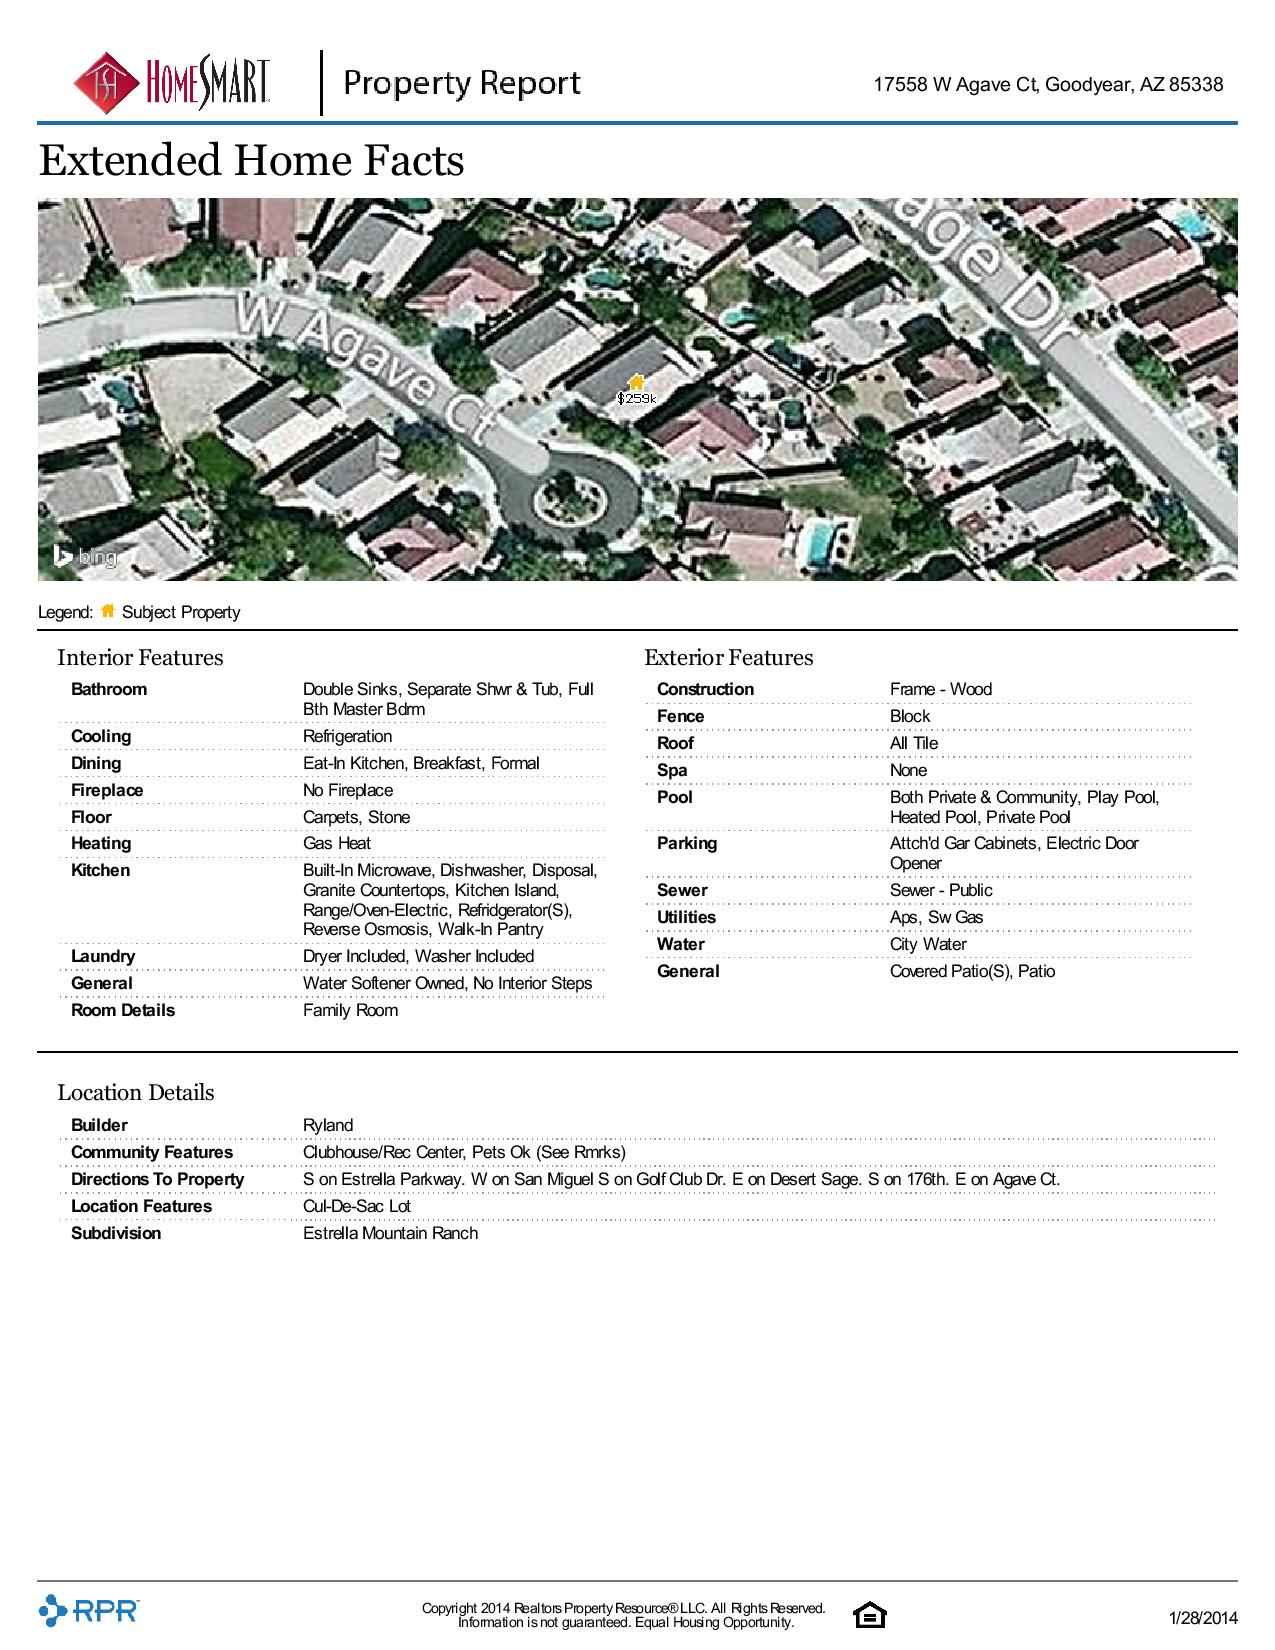 17558-W-Agave-Ct-Goodyear-AZ-85338.pdf-page-004